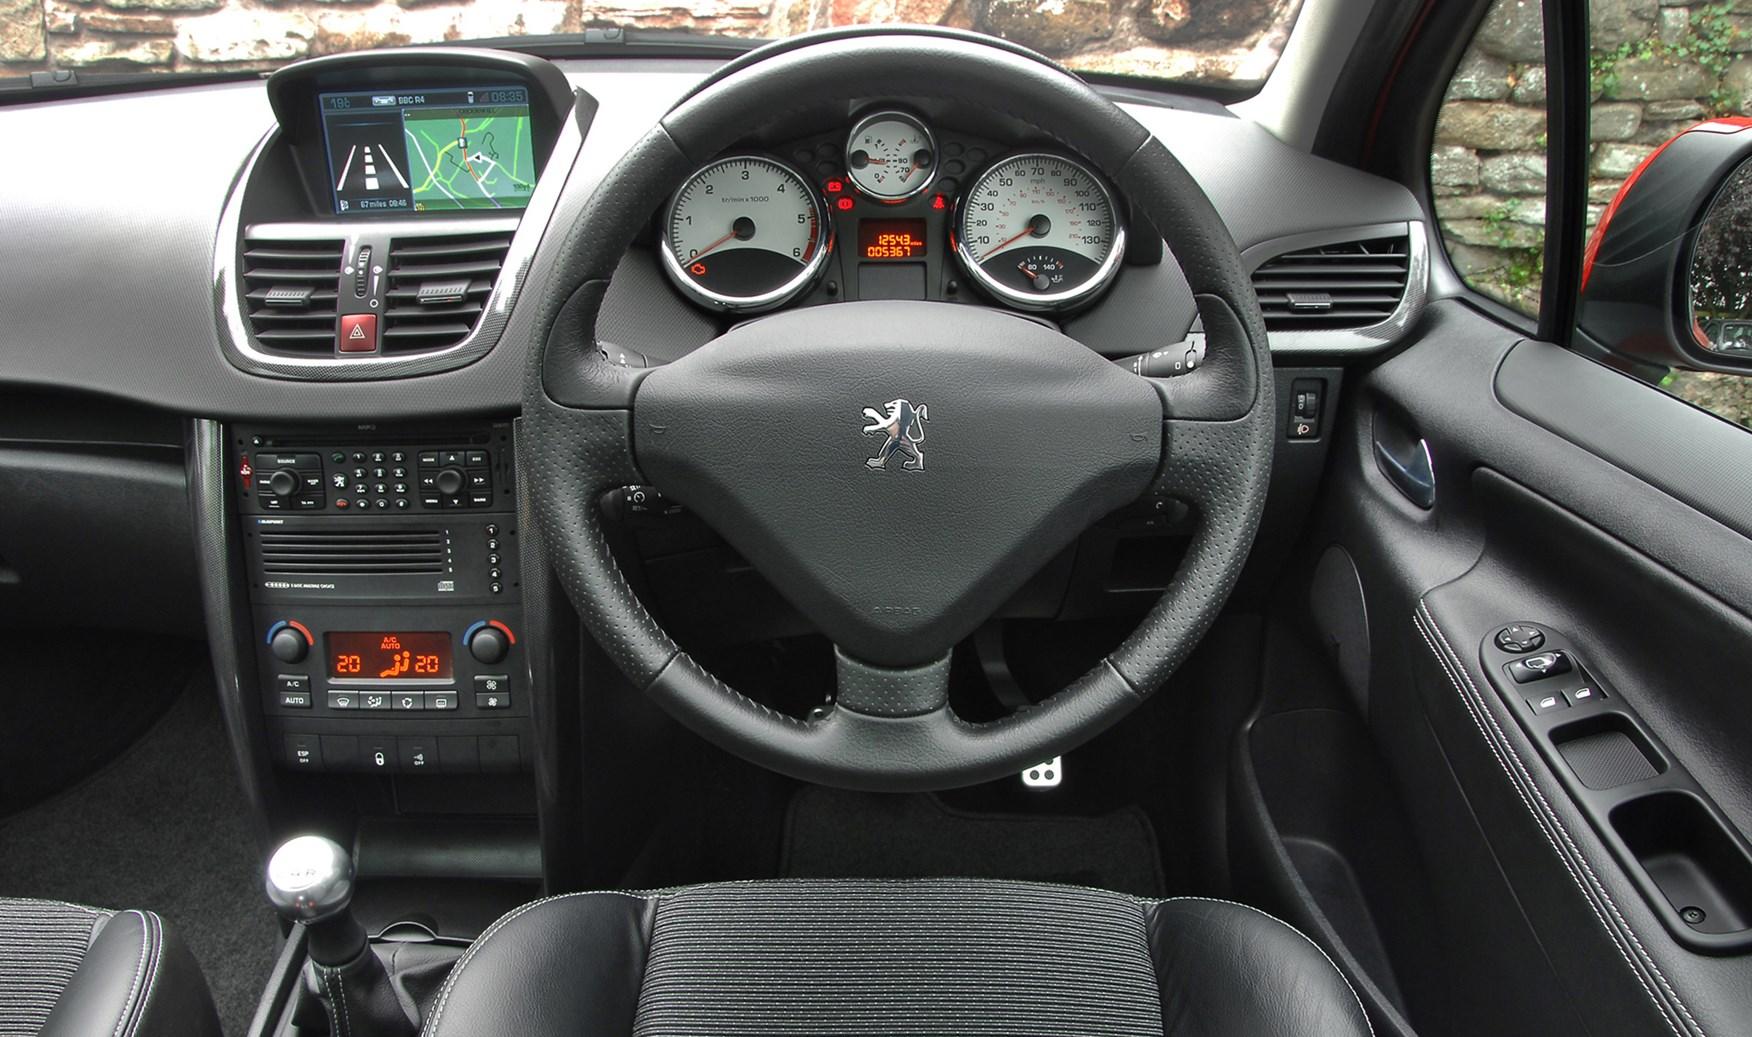 Peugeot 207 hatchback review 2006 2012 parkers for Peugeot 207 interior